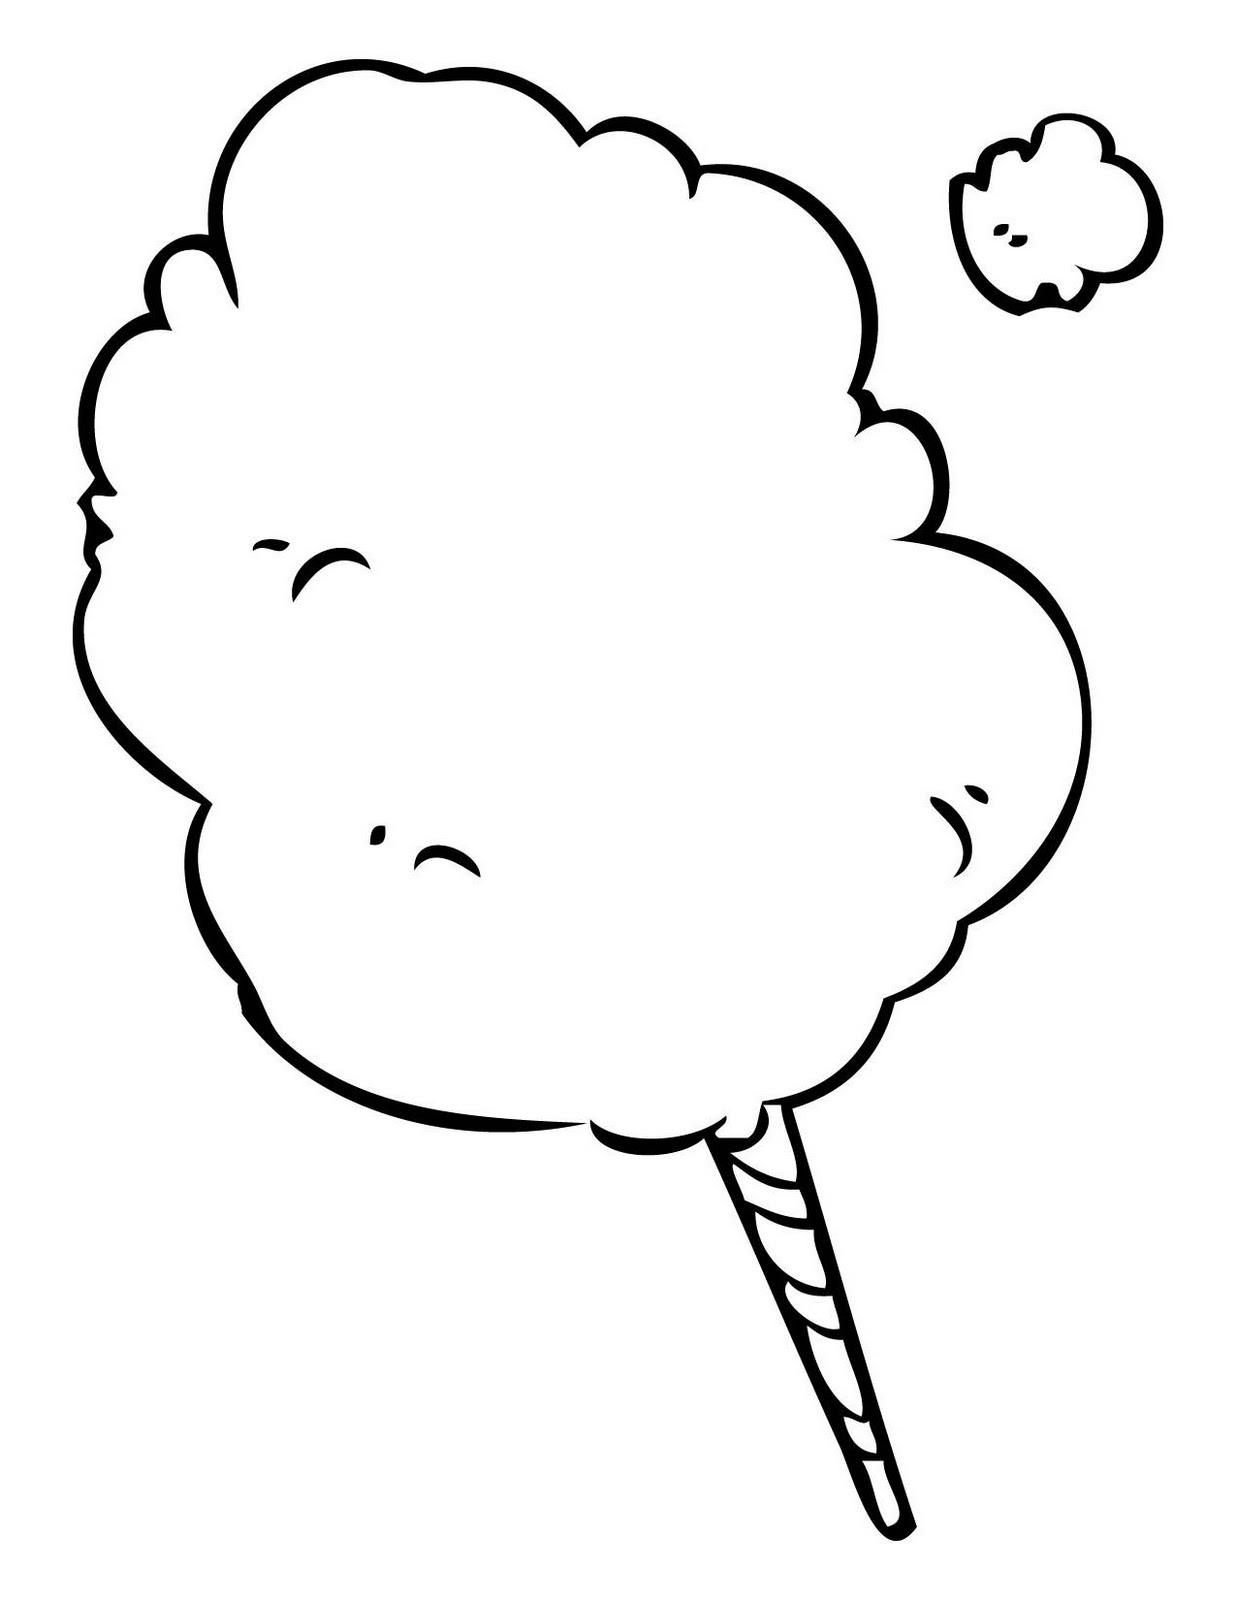 Free Cotton Balls Cliparts Download Free Clip Art Free Clip Art On Clipart Library